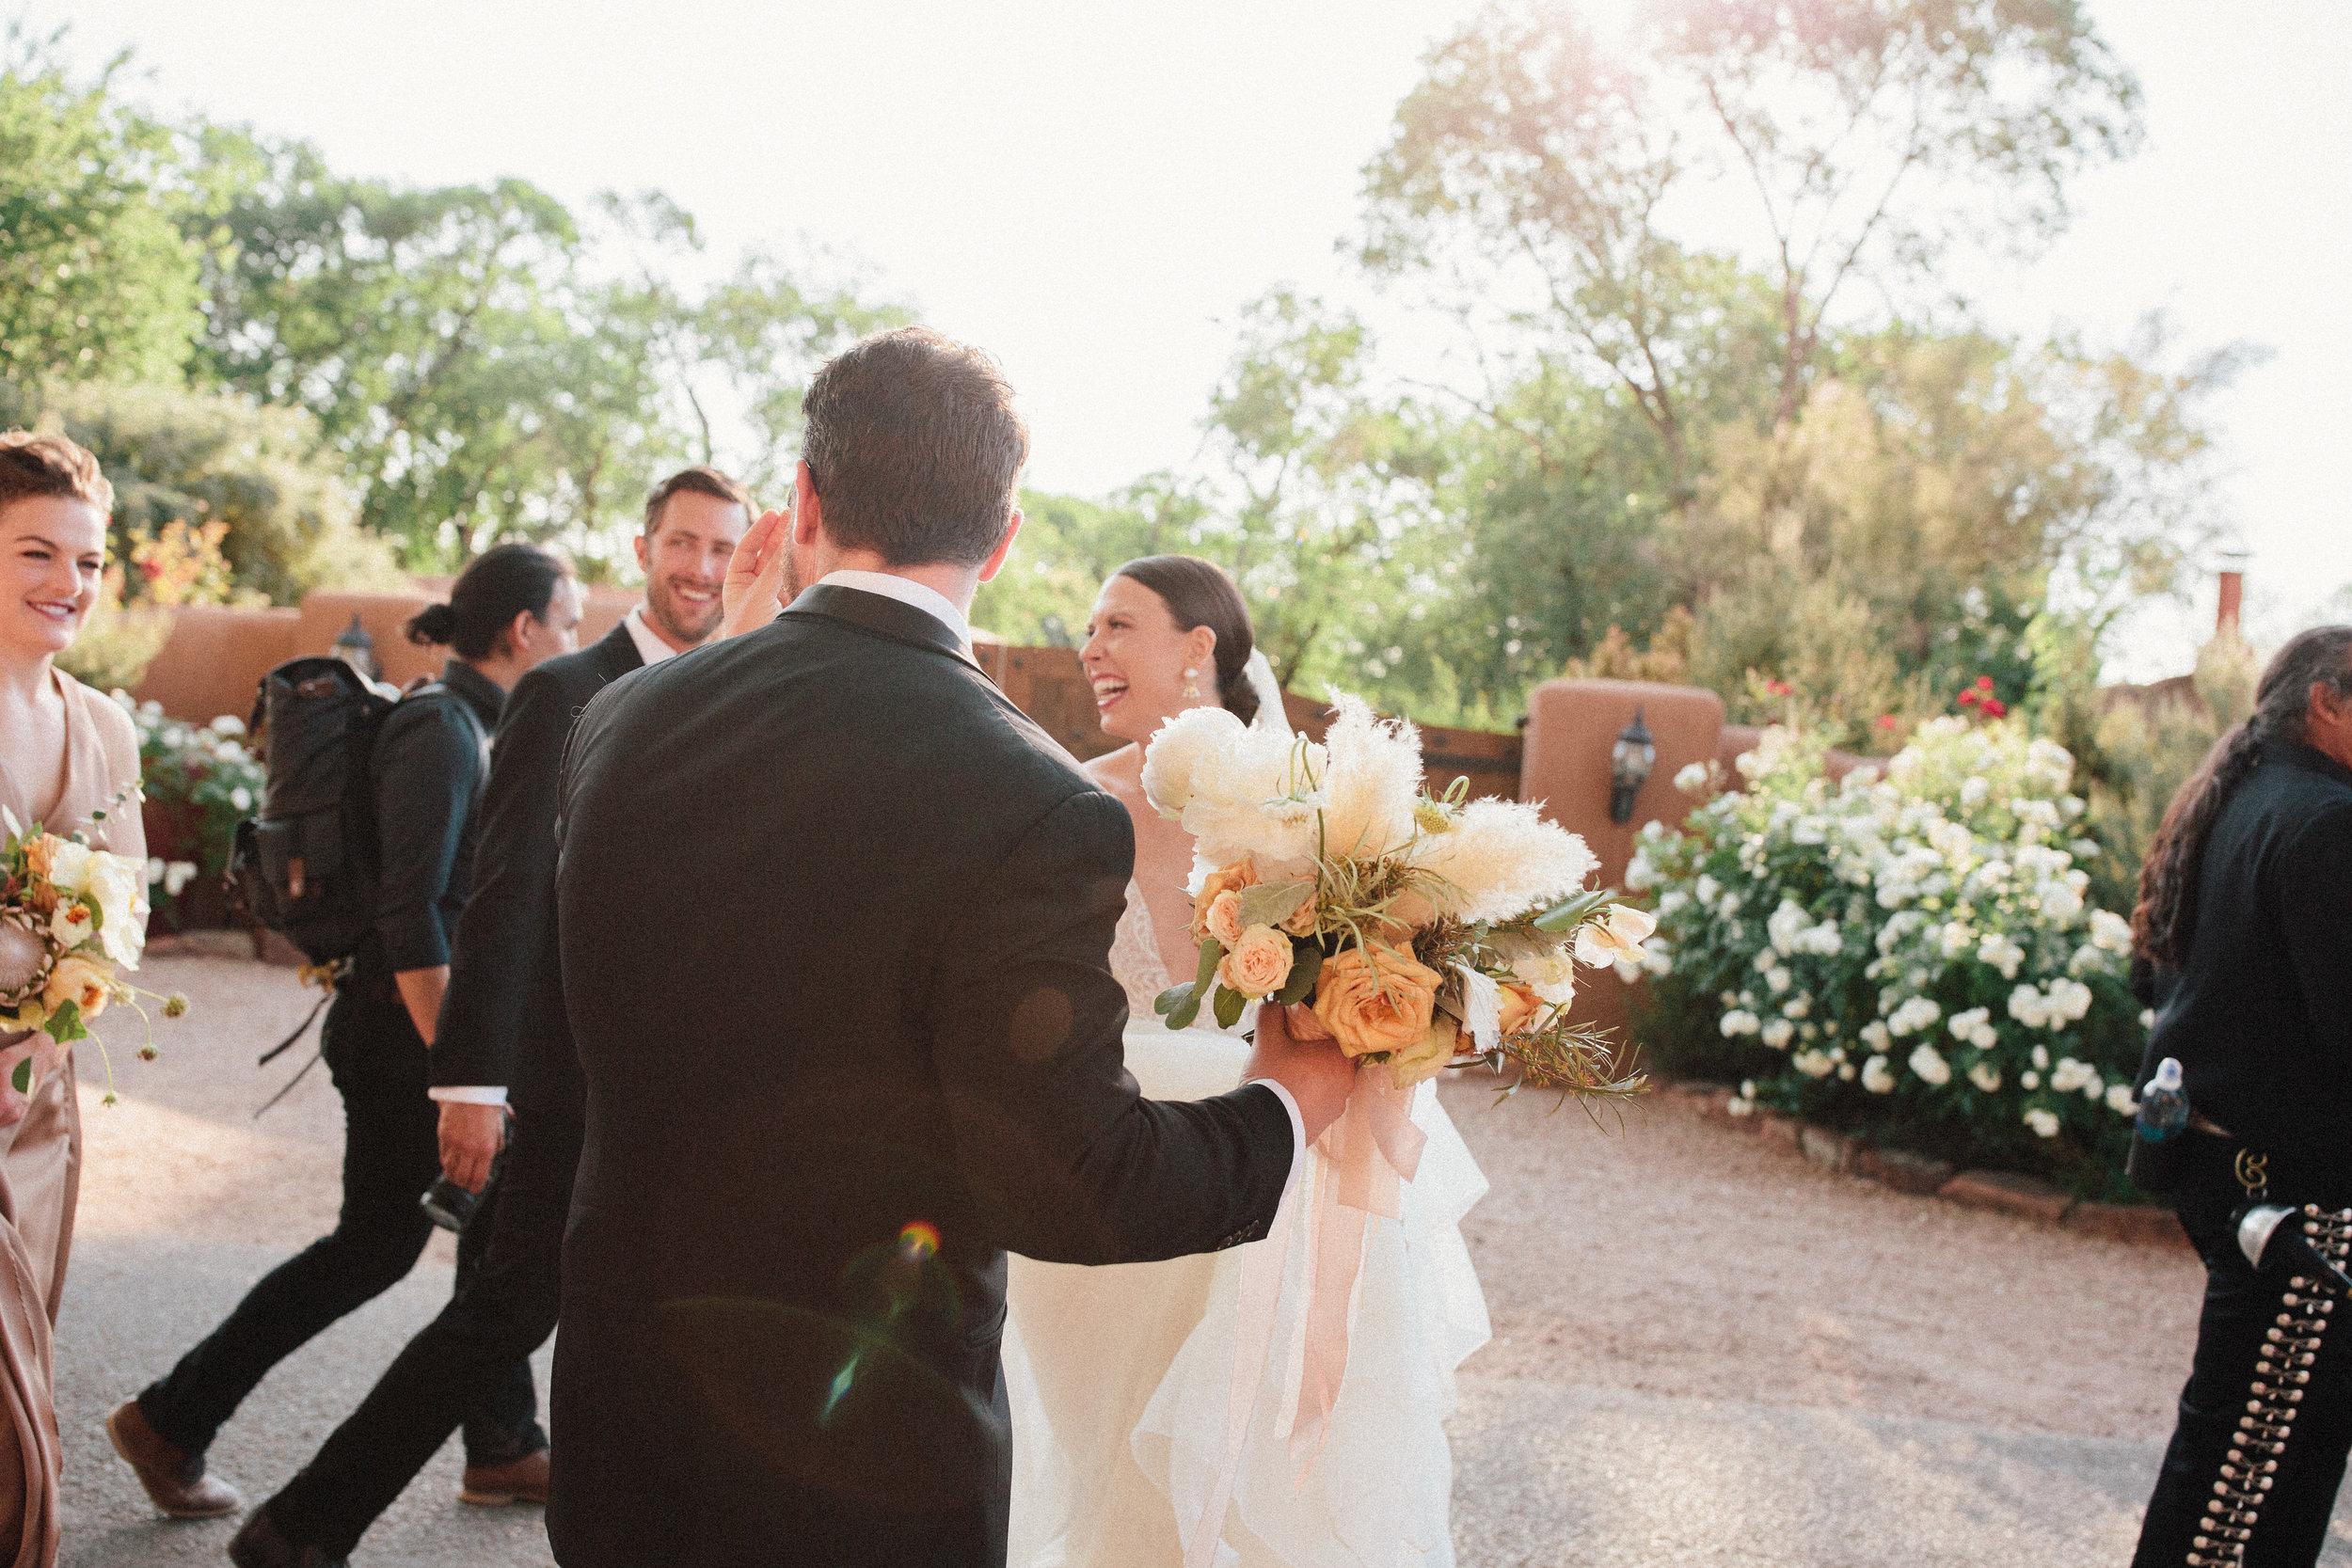 landry_lovelace_wedding_jbobephoto-606.jpg